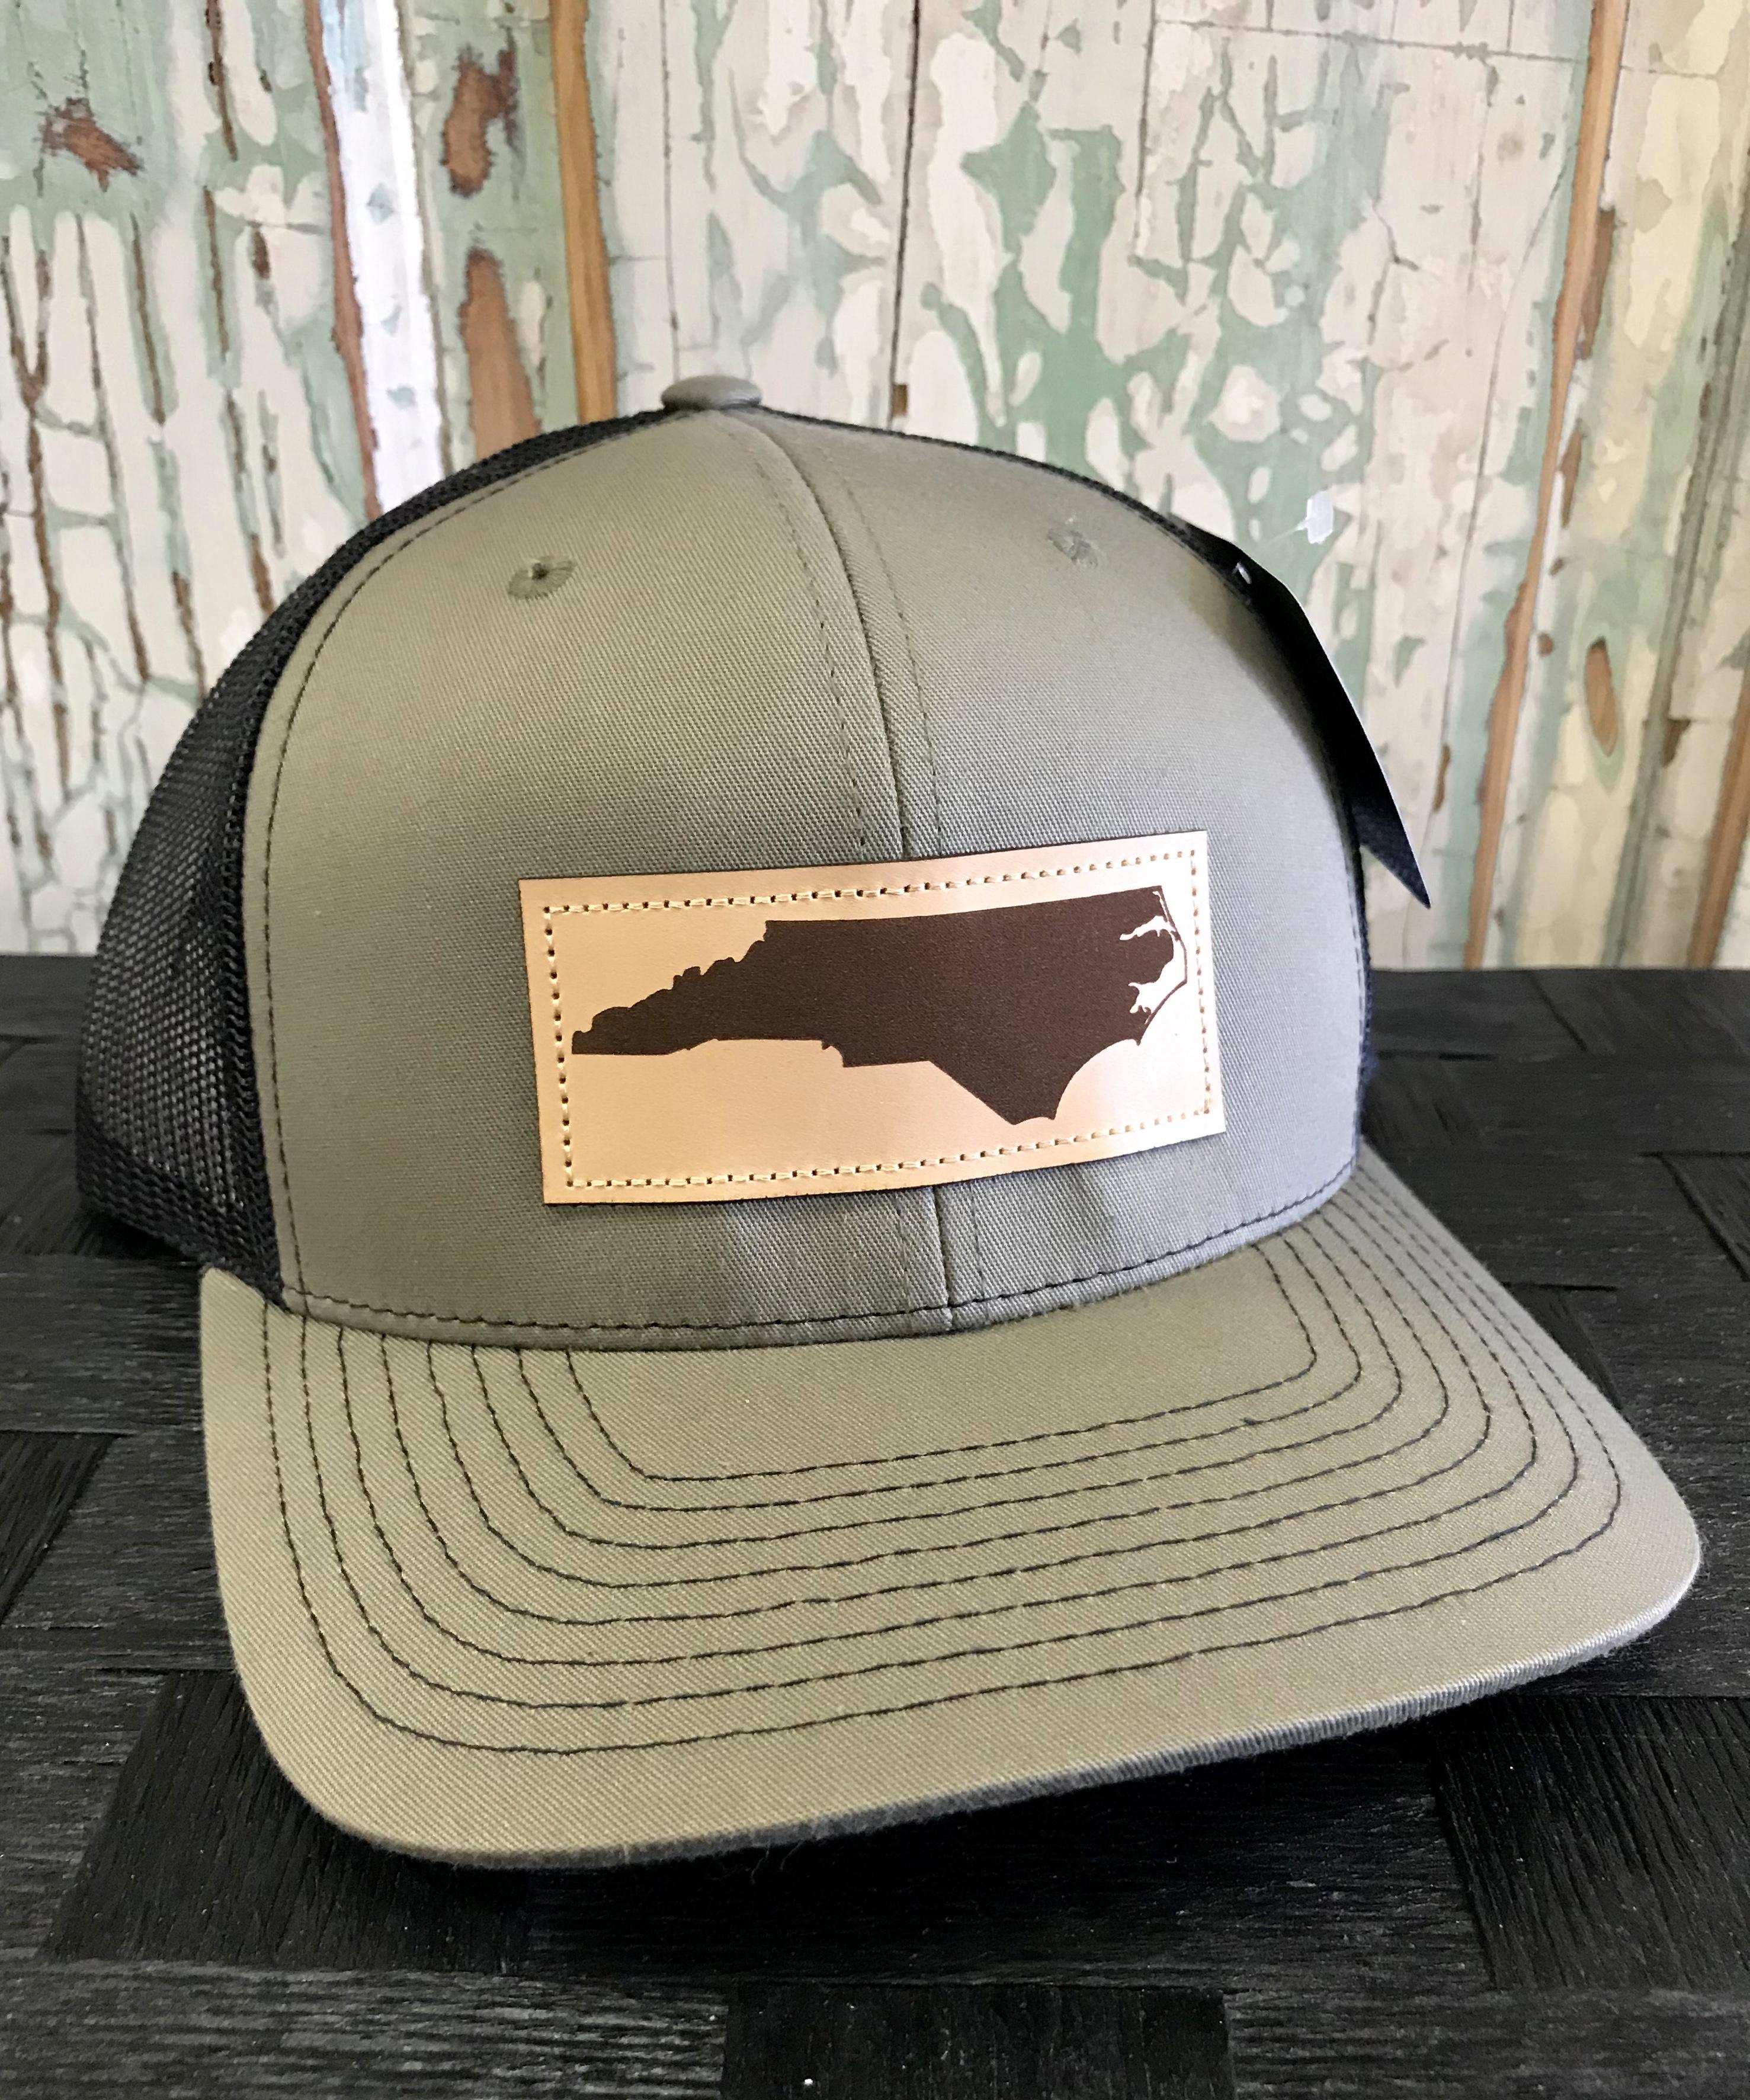 e14e43ff4cf5a Richardson Mesh Back North Carolina Leather Patch Trucker Hat Loden Black  Accessories